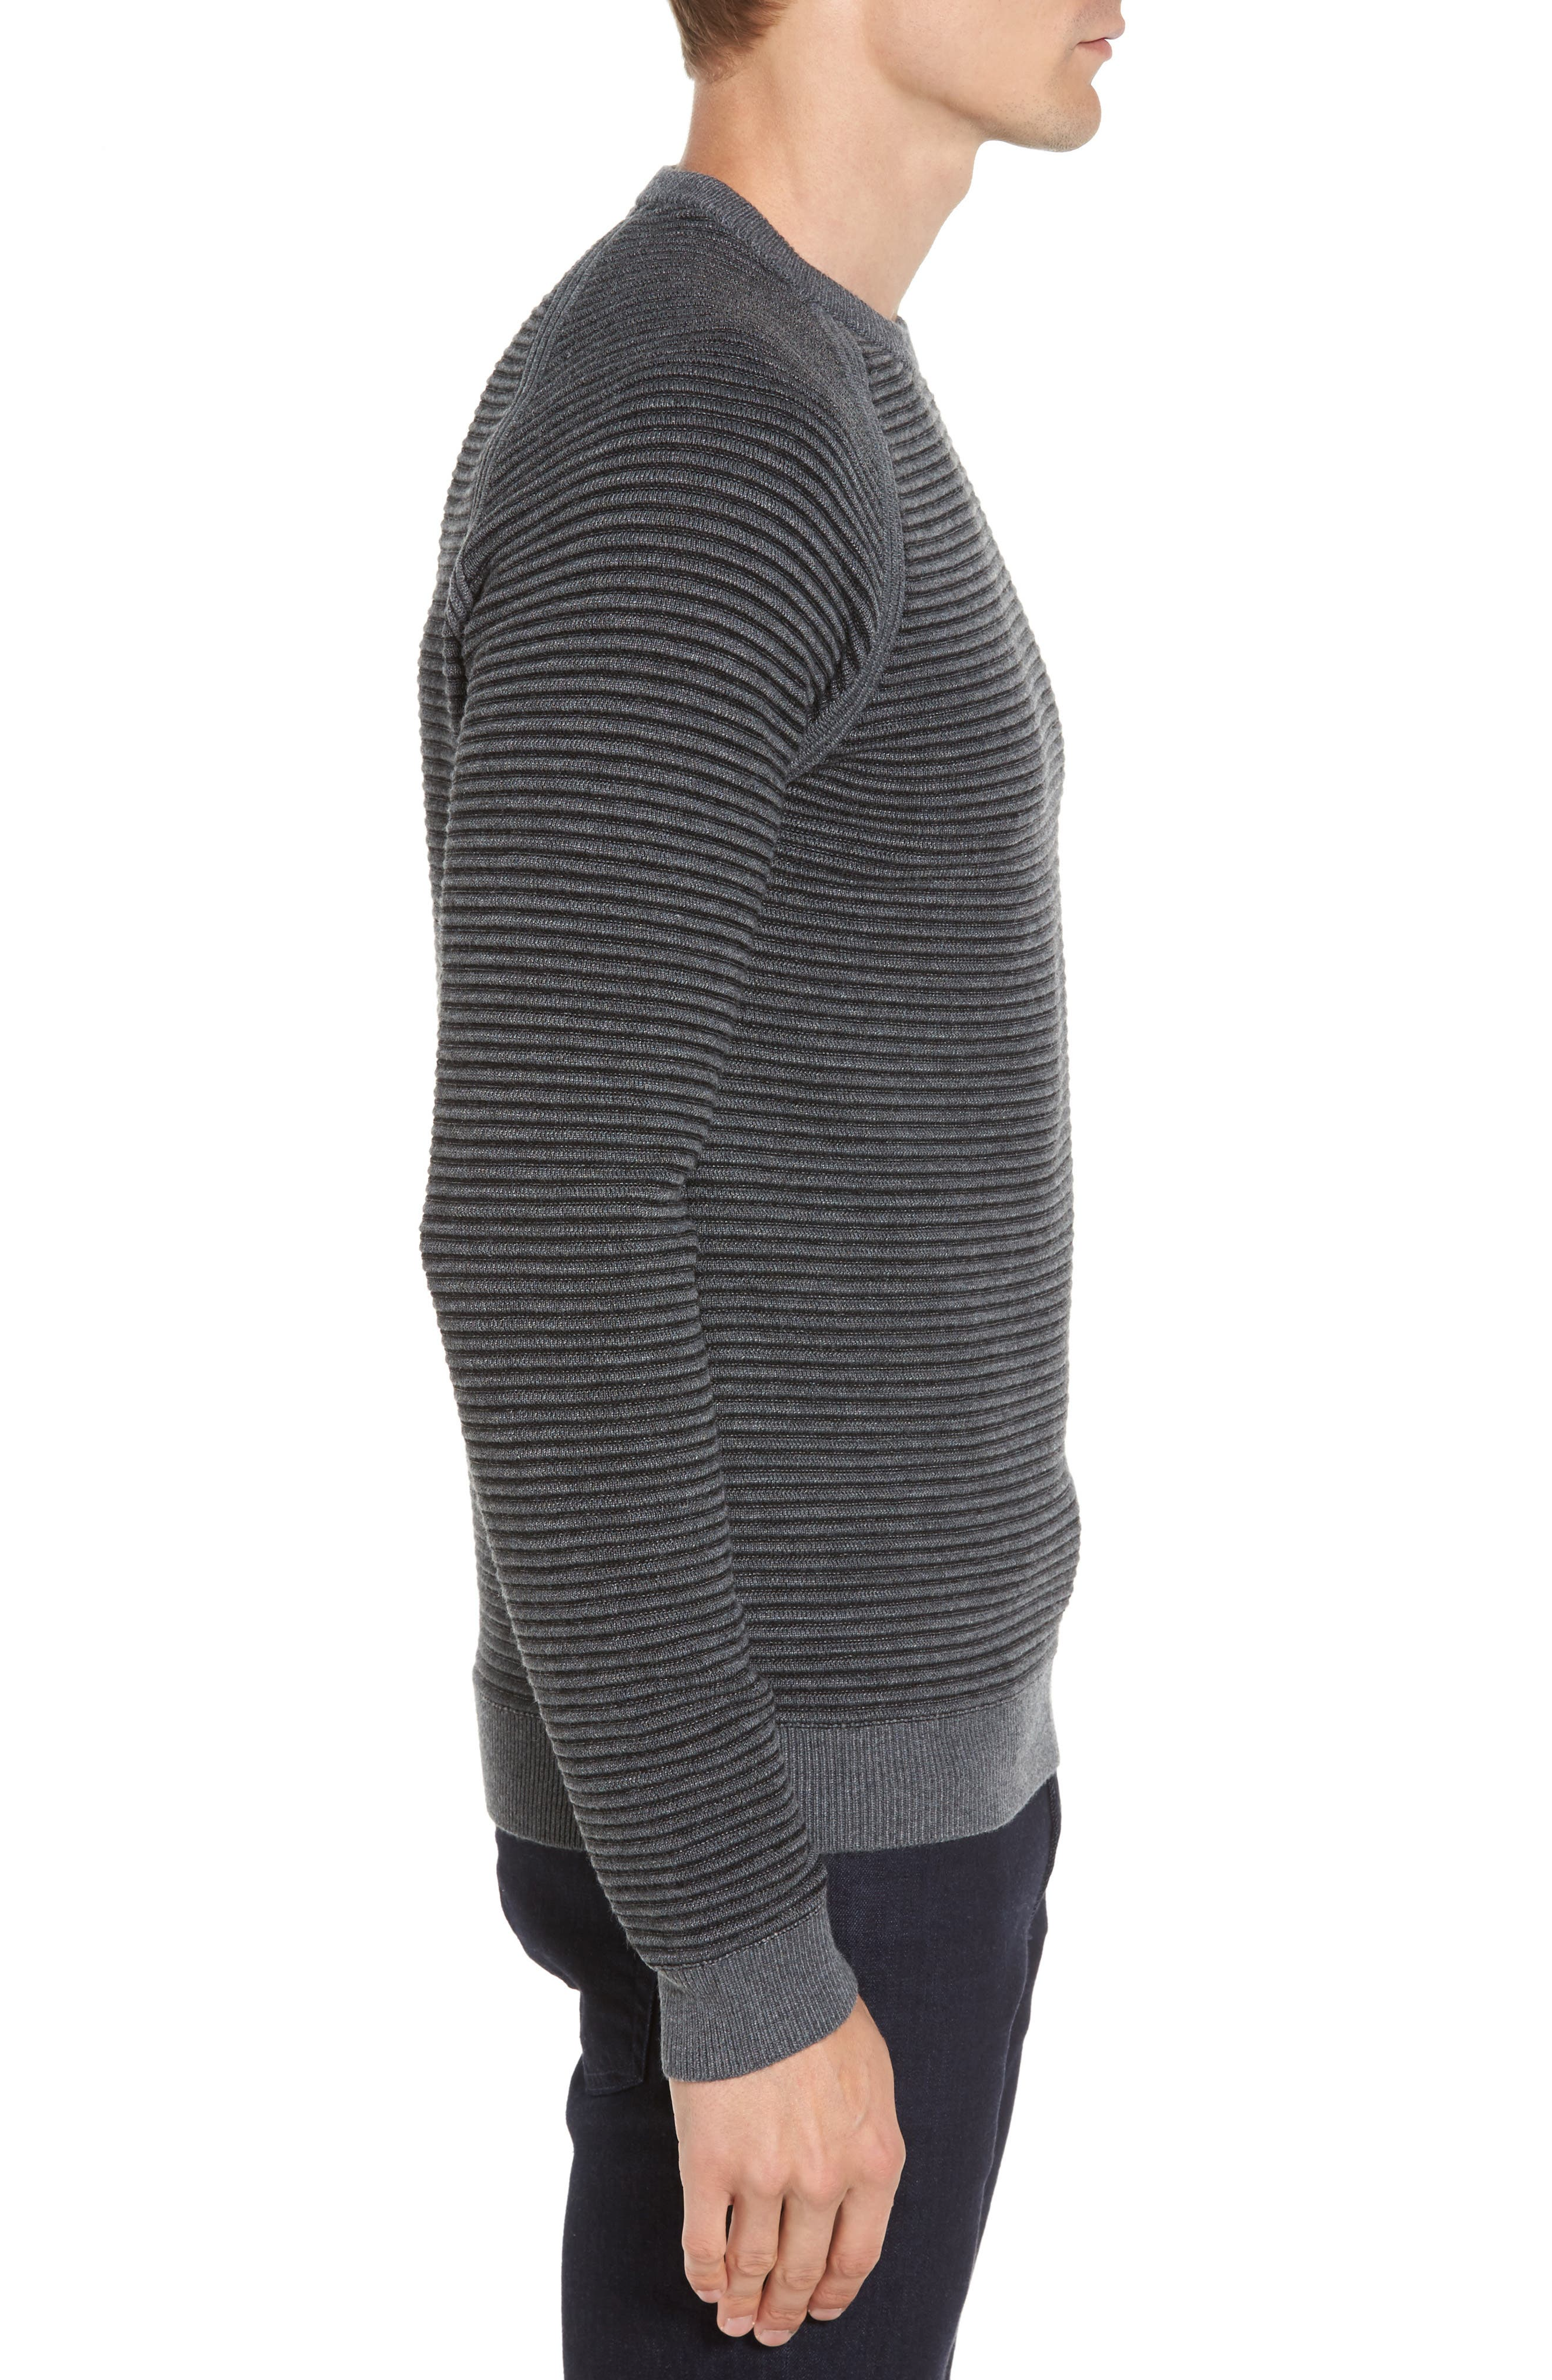 Cashoo Slim Fit Ribbed Sweatshirt,                             Alternate thumbnail 3, color,                             030